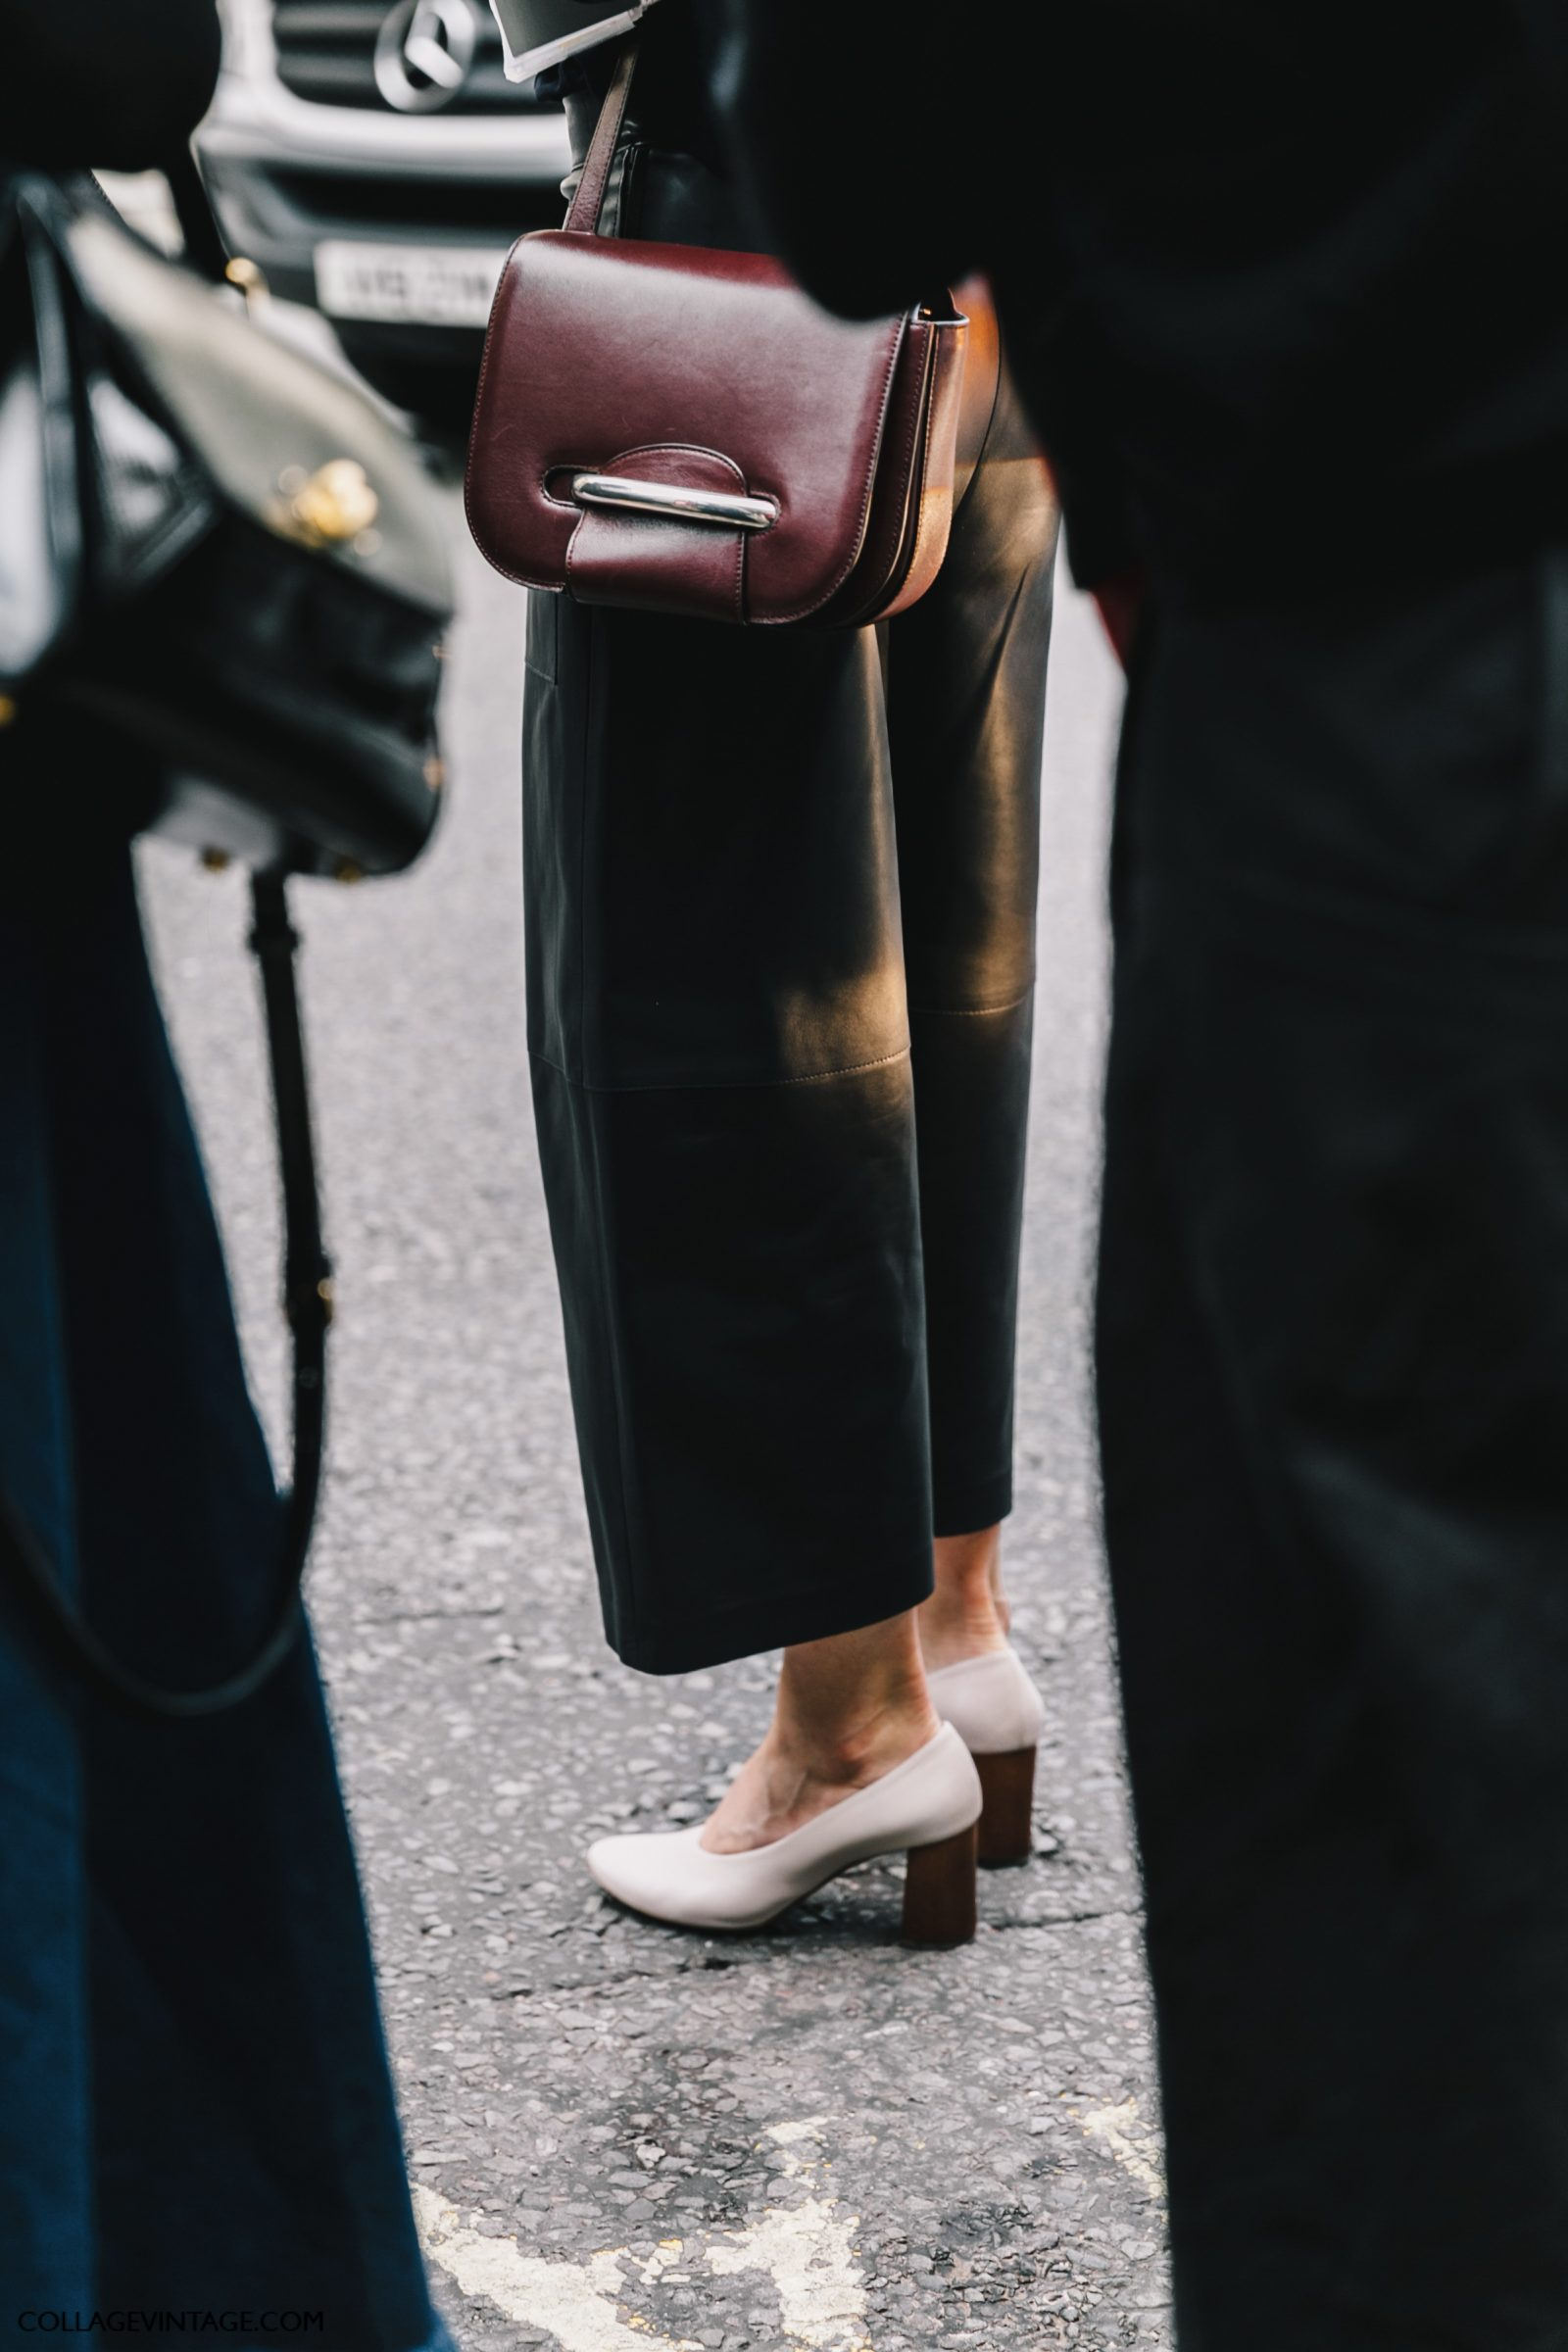 lfw-london_fashion_week_ss17-street_style-outfits-collage_vintage-vintage-roksanda-christopher_kane-joseph-230